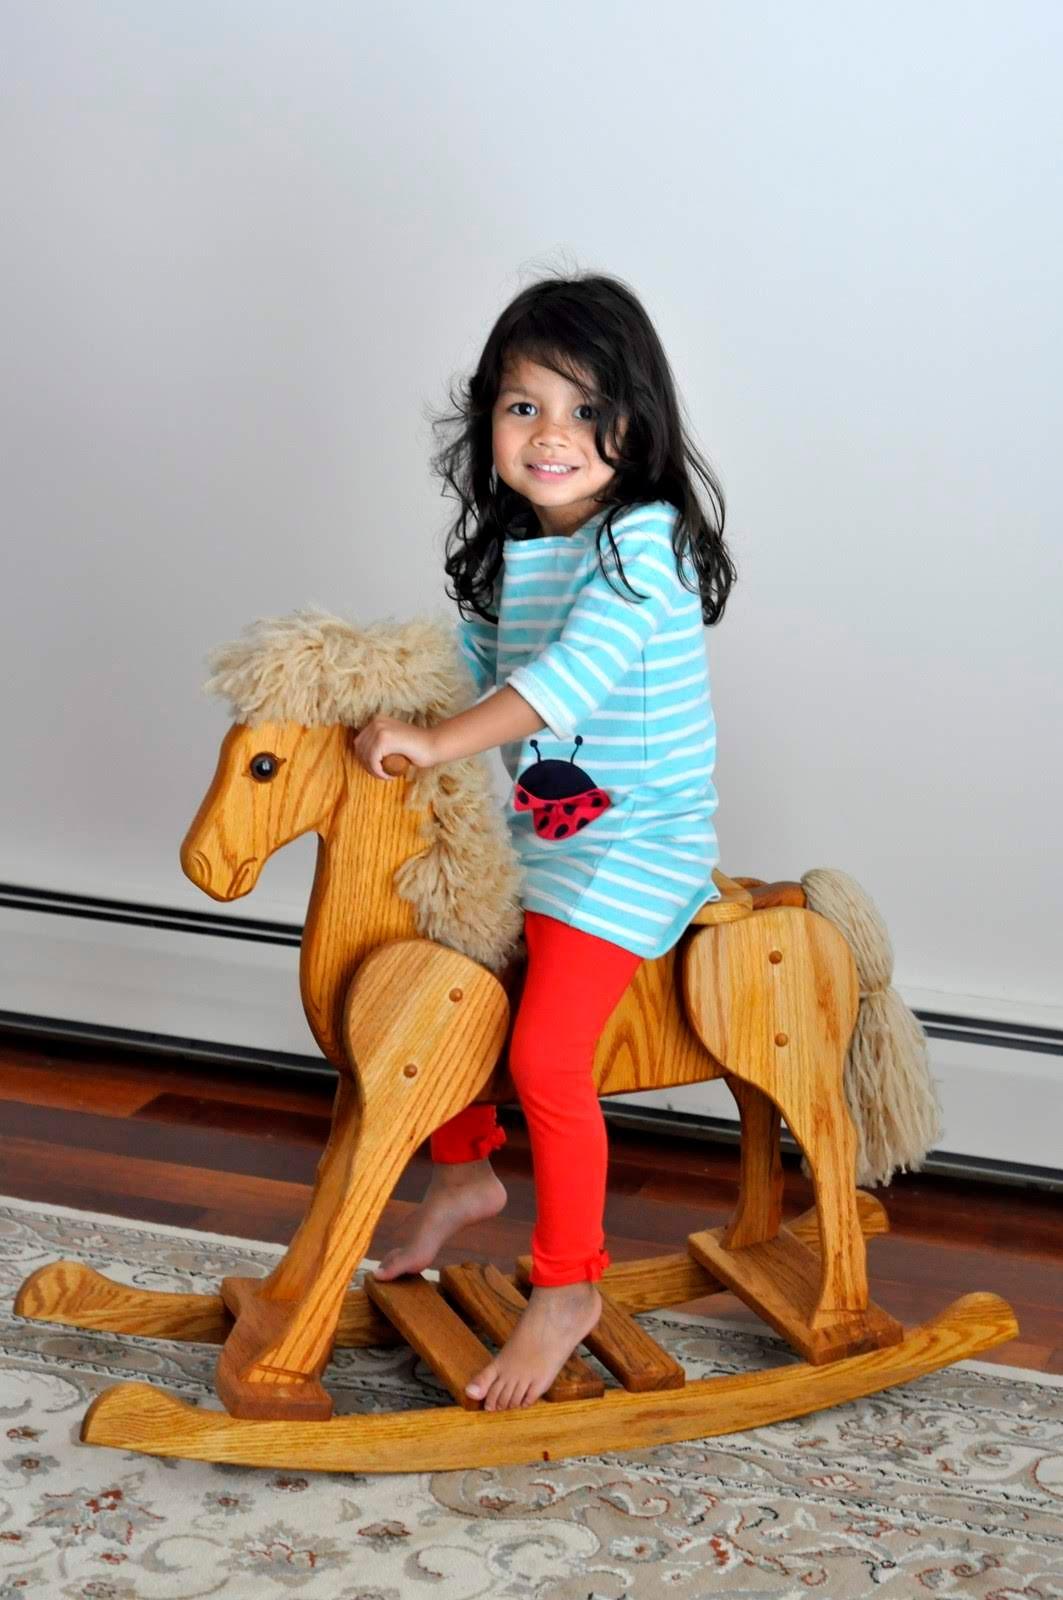 Wooden-Rocking-Horse-tasteasyougo.com